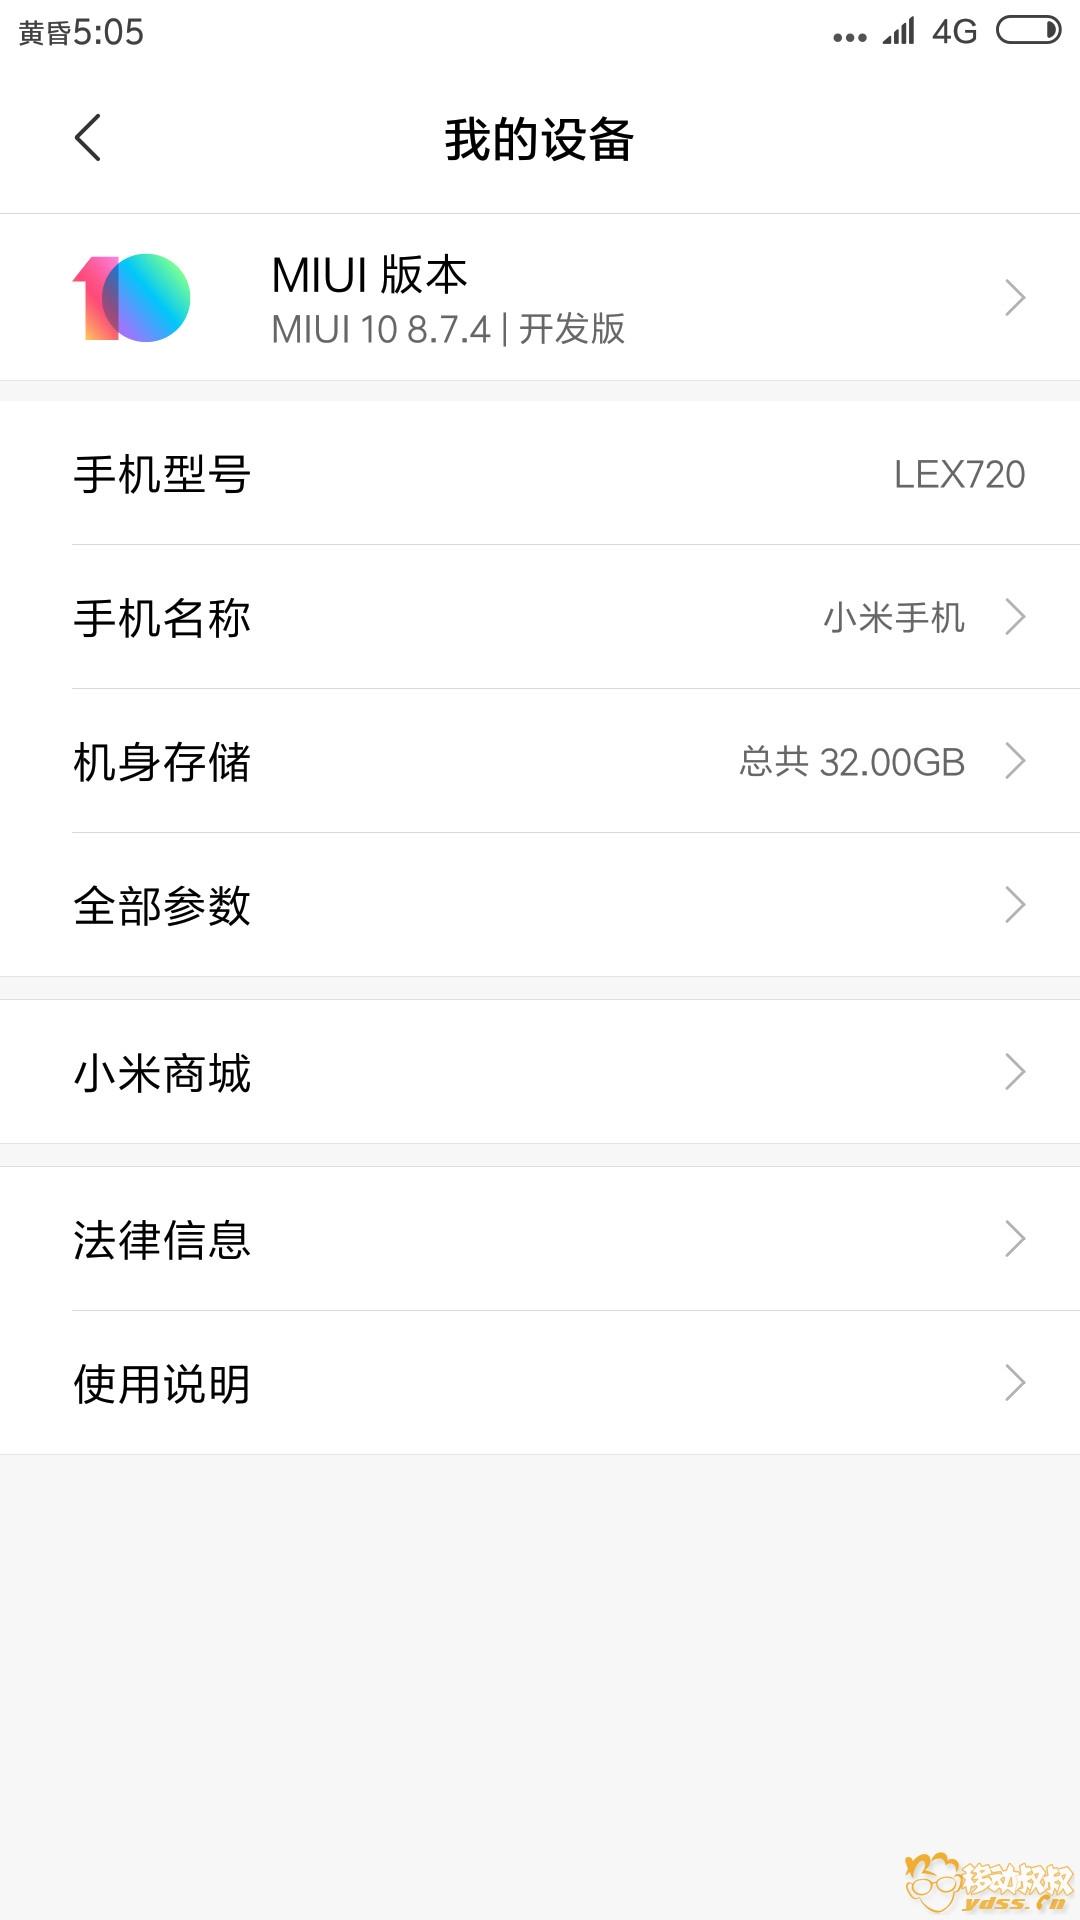 Screenshot_2018-07-04-17-05-13-418_com.android.settings.jpg